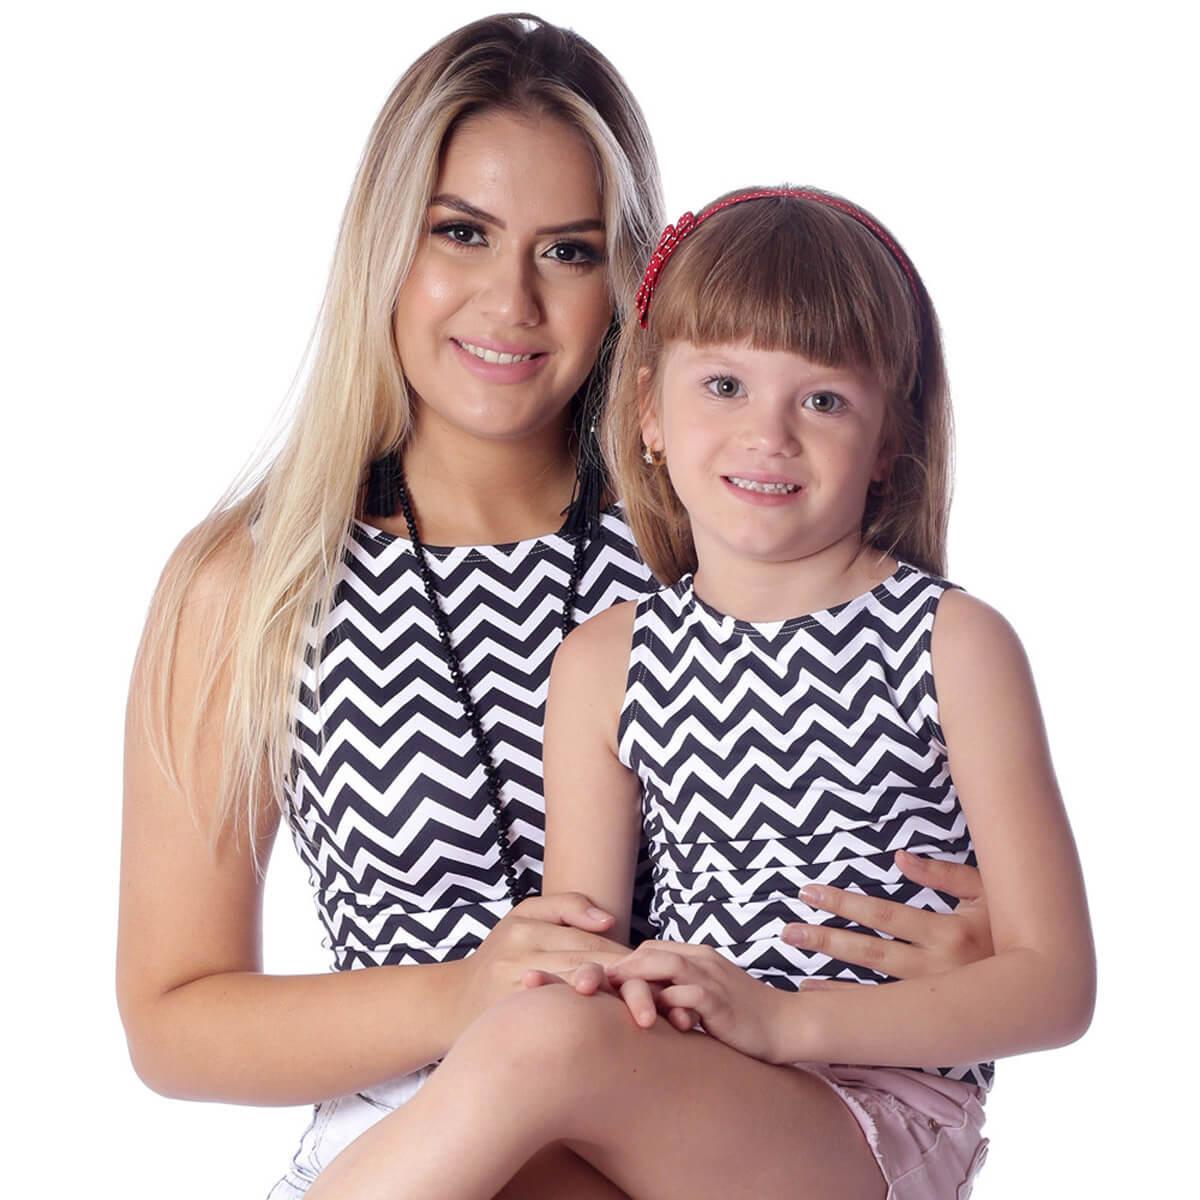 Regata Infantil Estampa Zig Zag Preto e Branco Feminina Decote Canoa